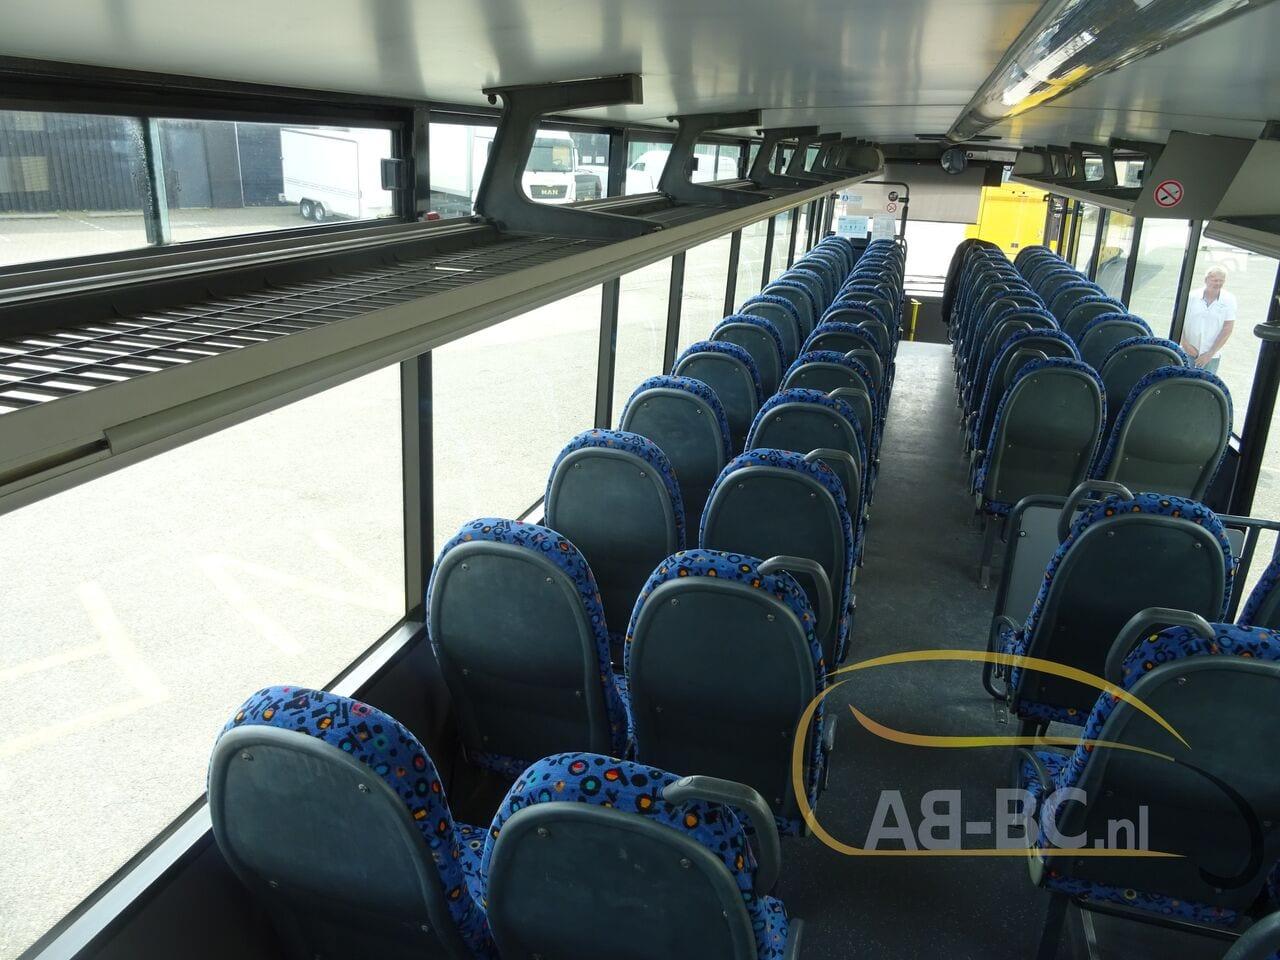 interurban-busMAN-Fast-64-seats---1619620024041714980_big_29429c2346658ff1a6235d372e7ef0dc--21042817163019598600